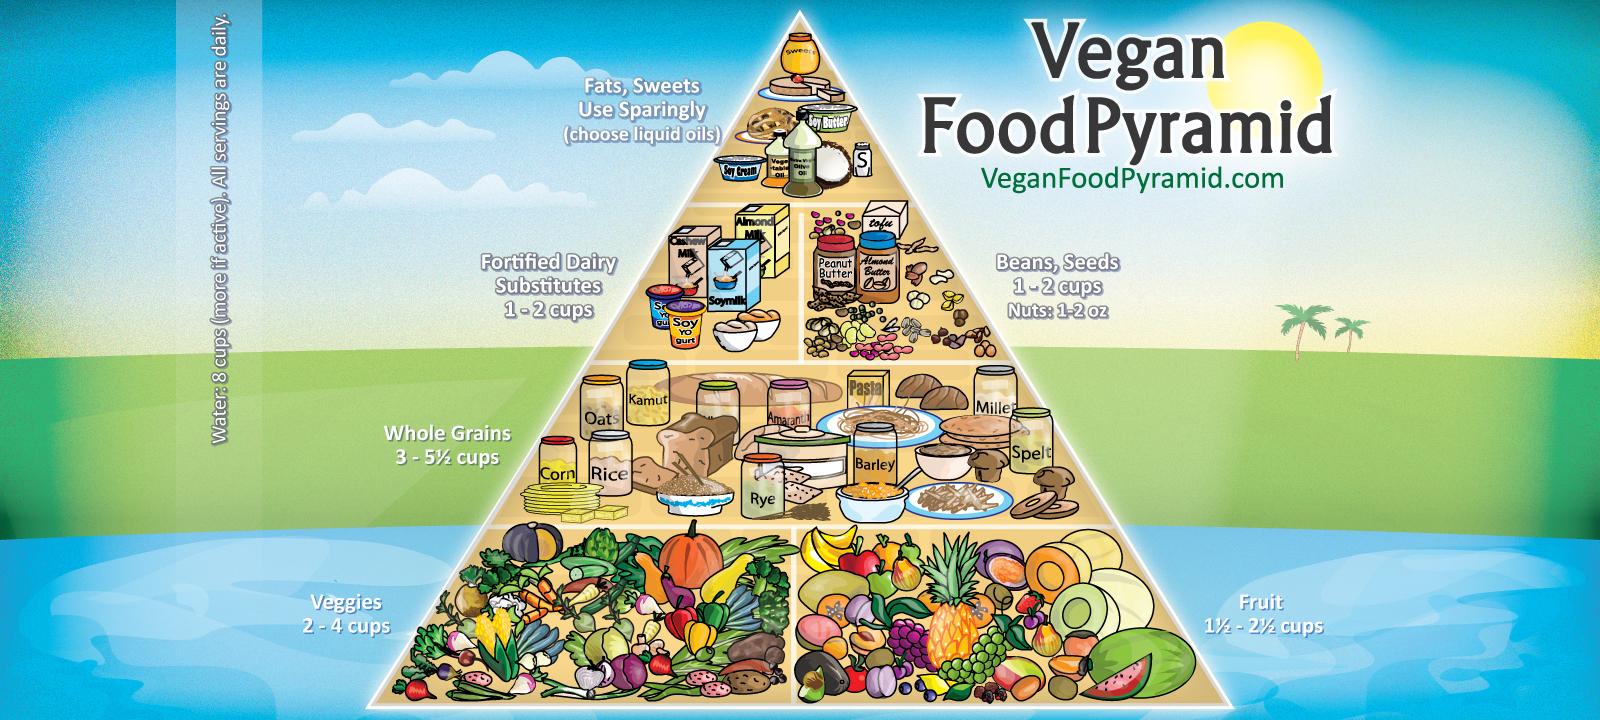 Any Vegan Food Stores